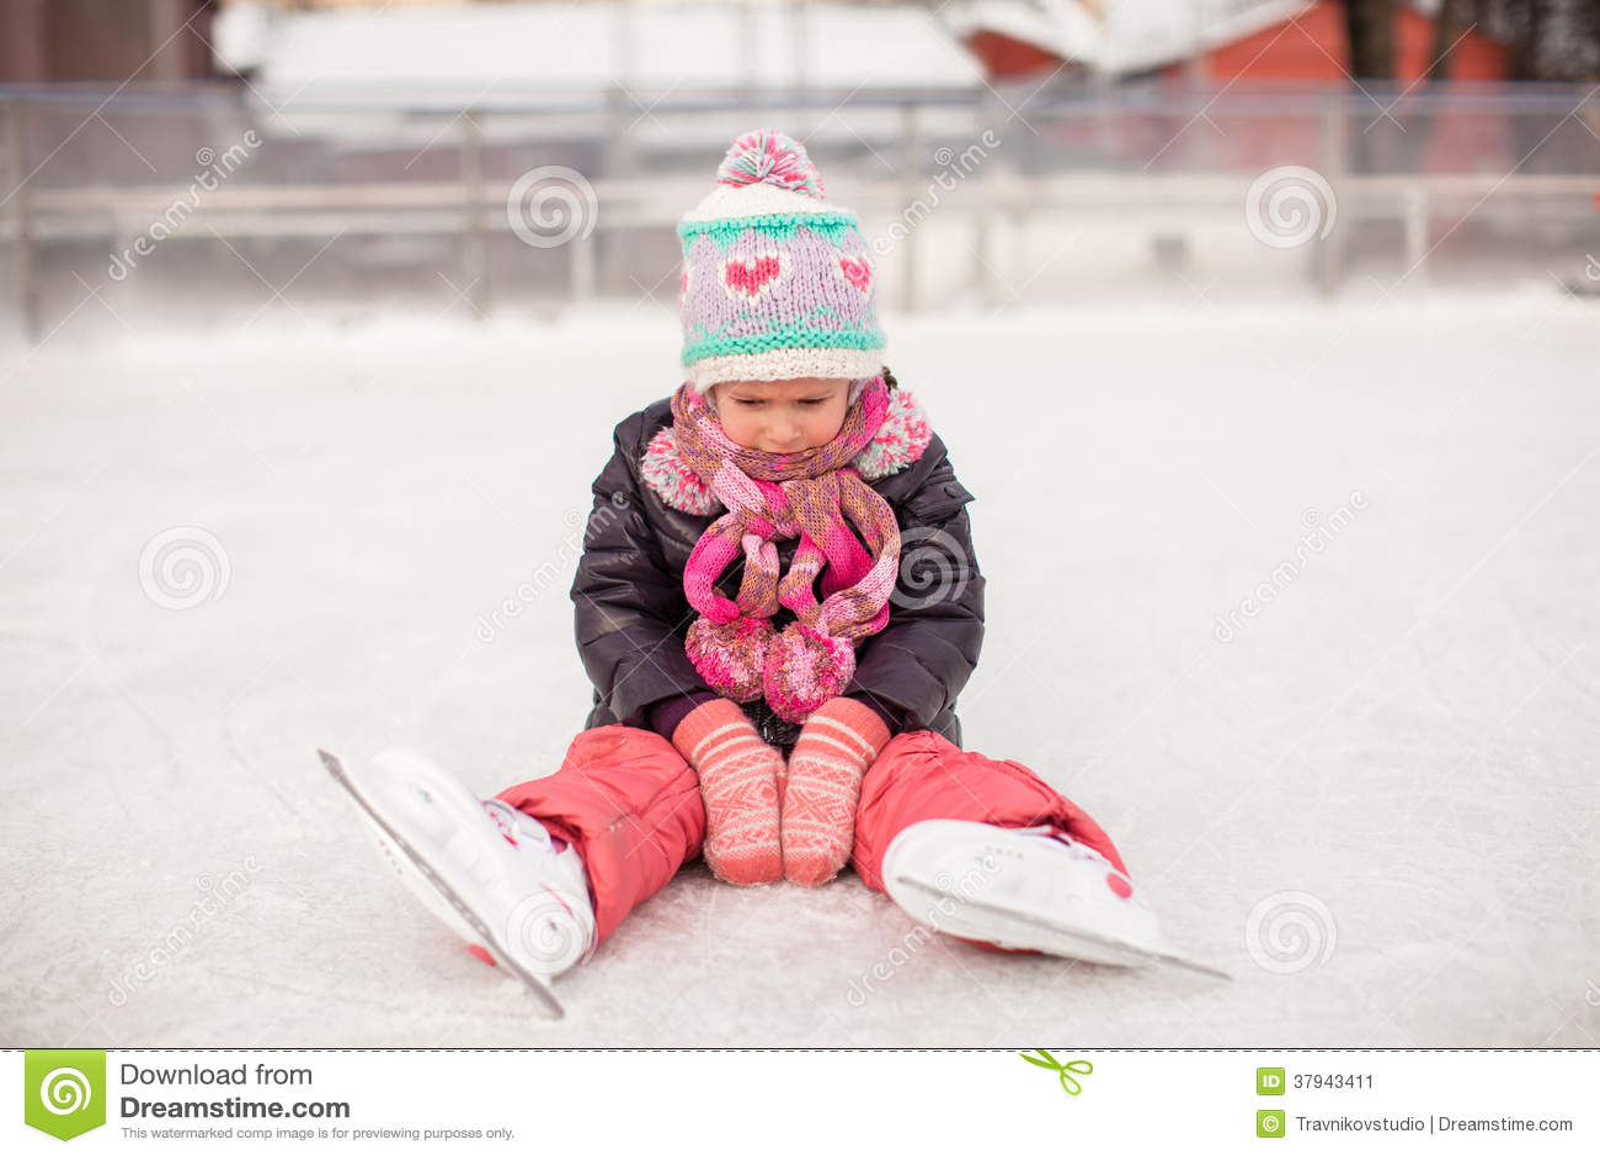 Little sad girl sitting on a skating rink after